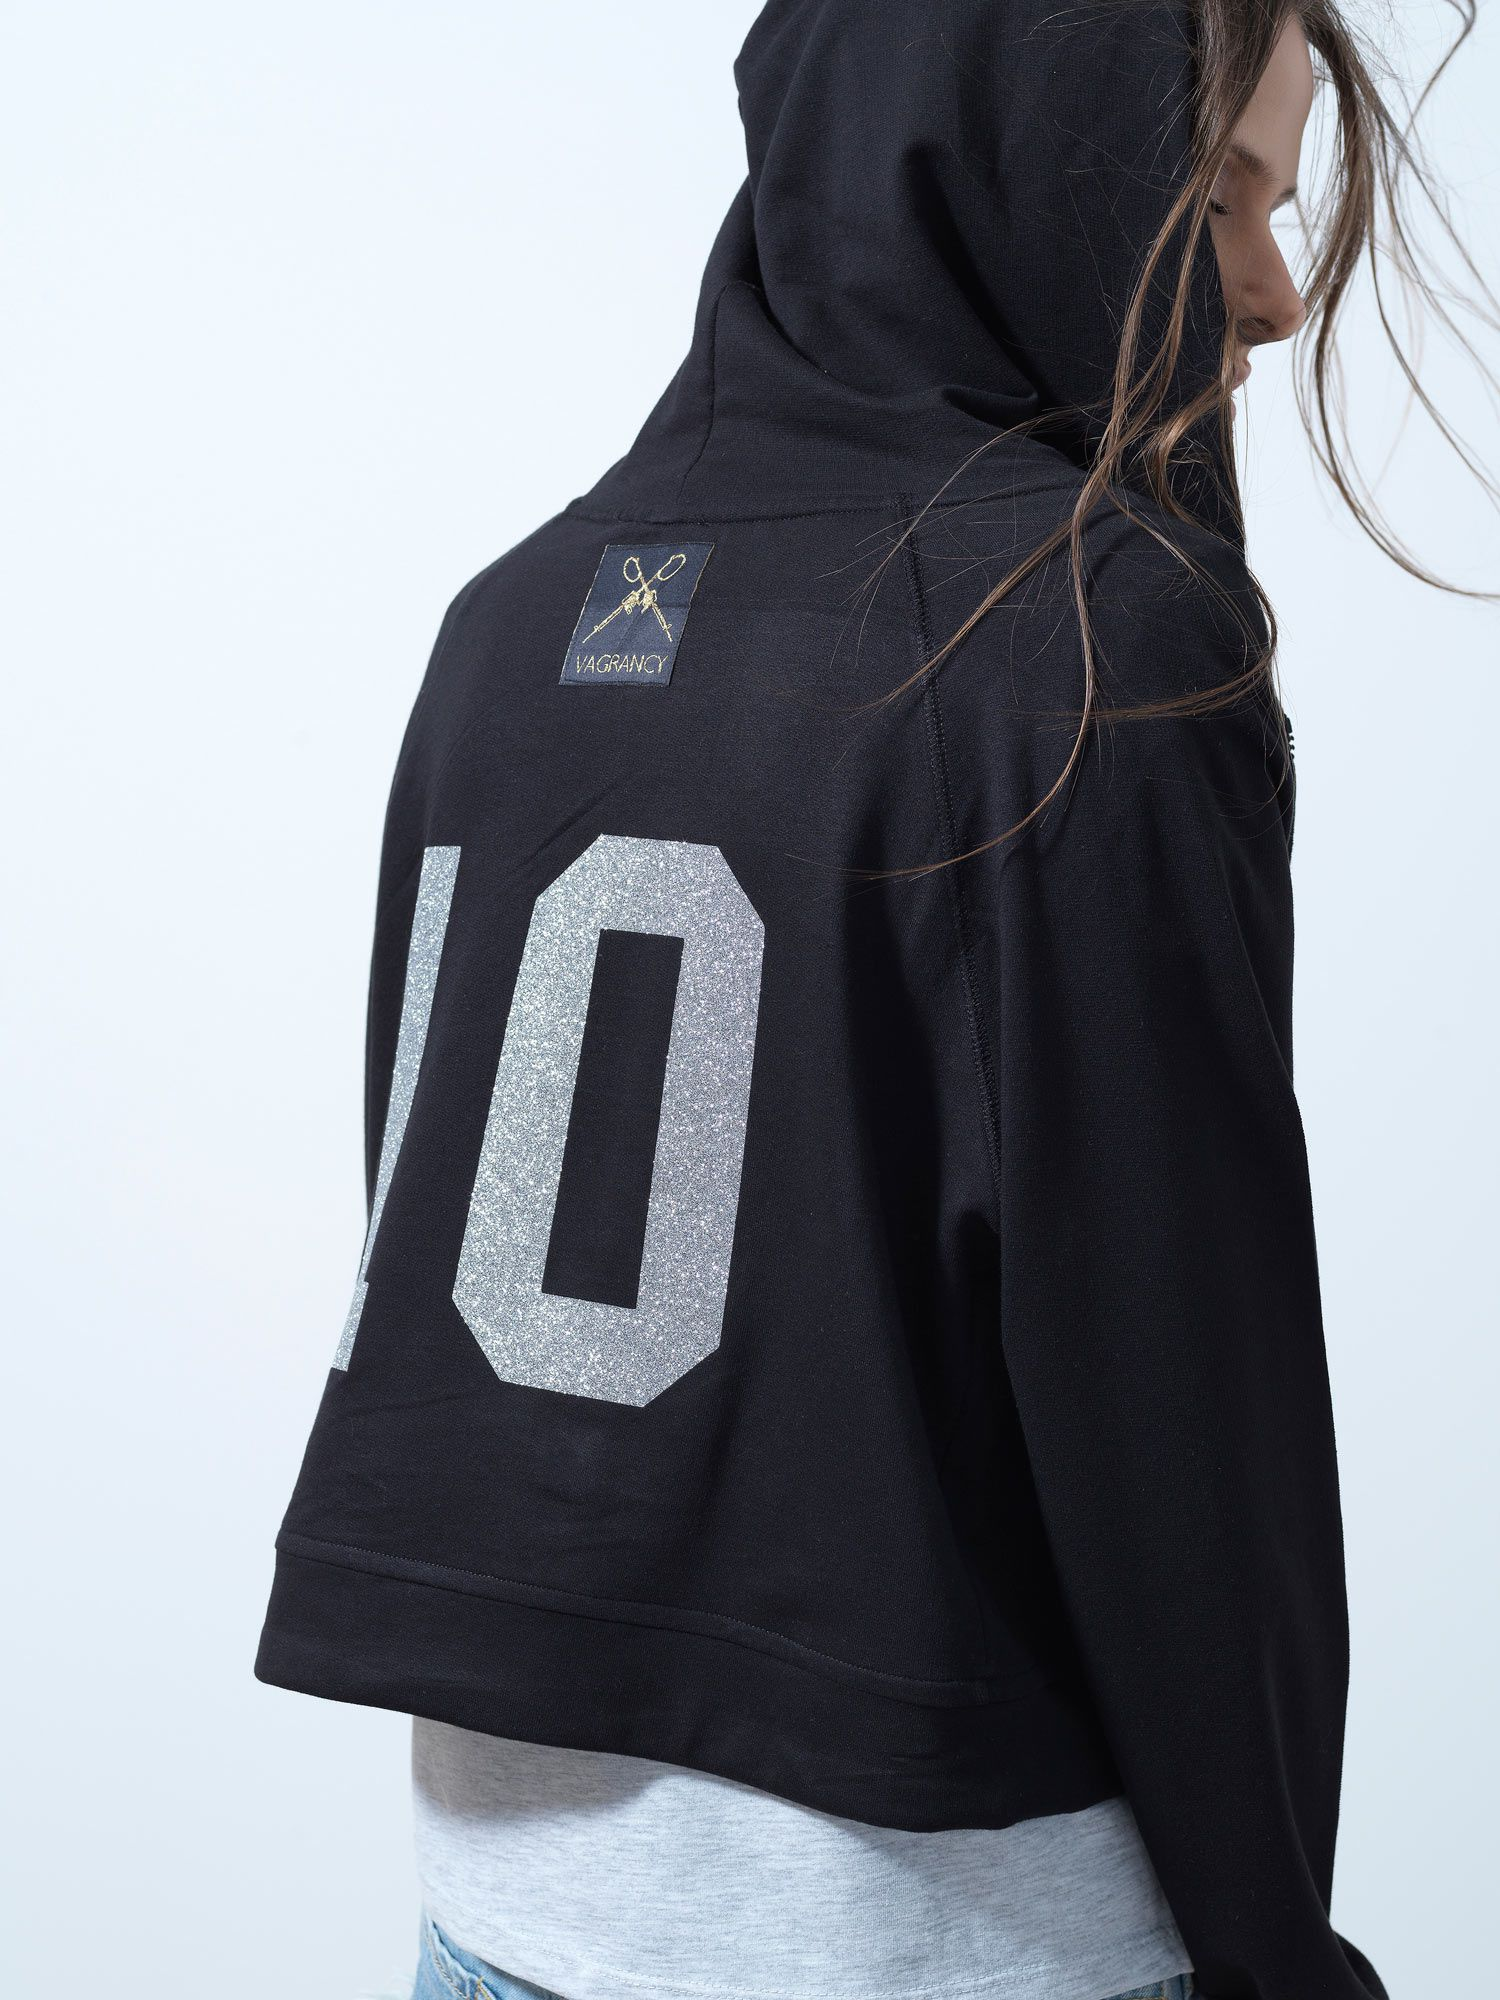 Silver 10 Black Jacket